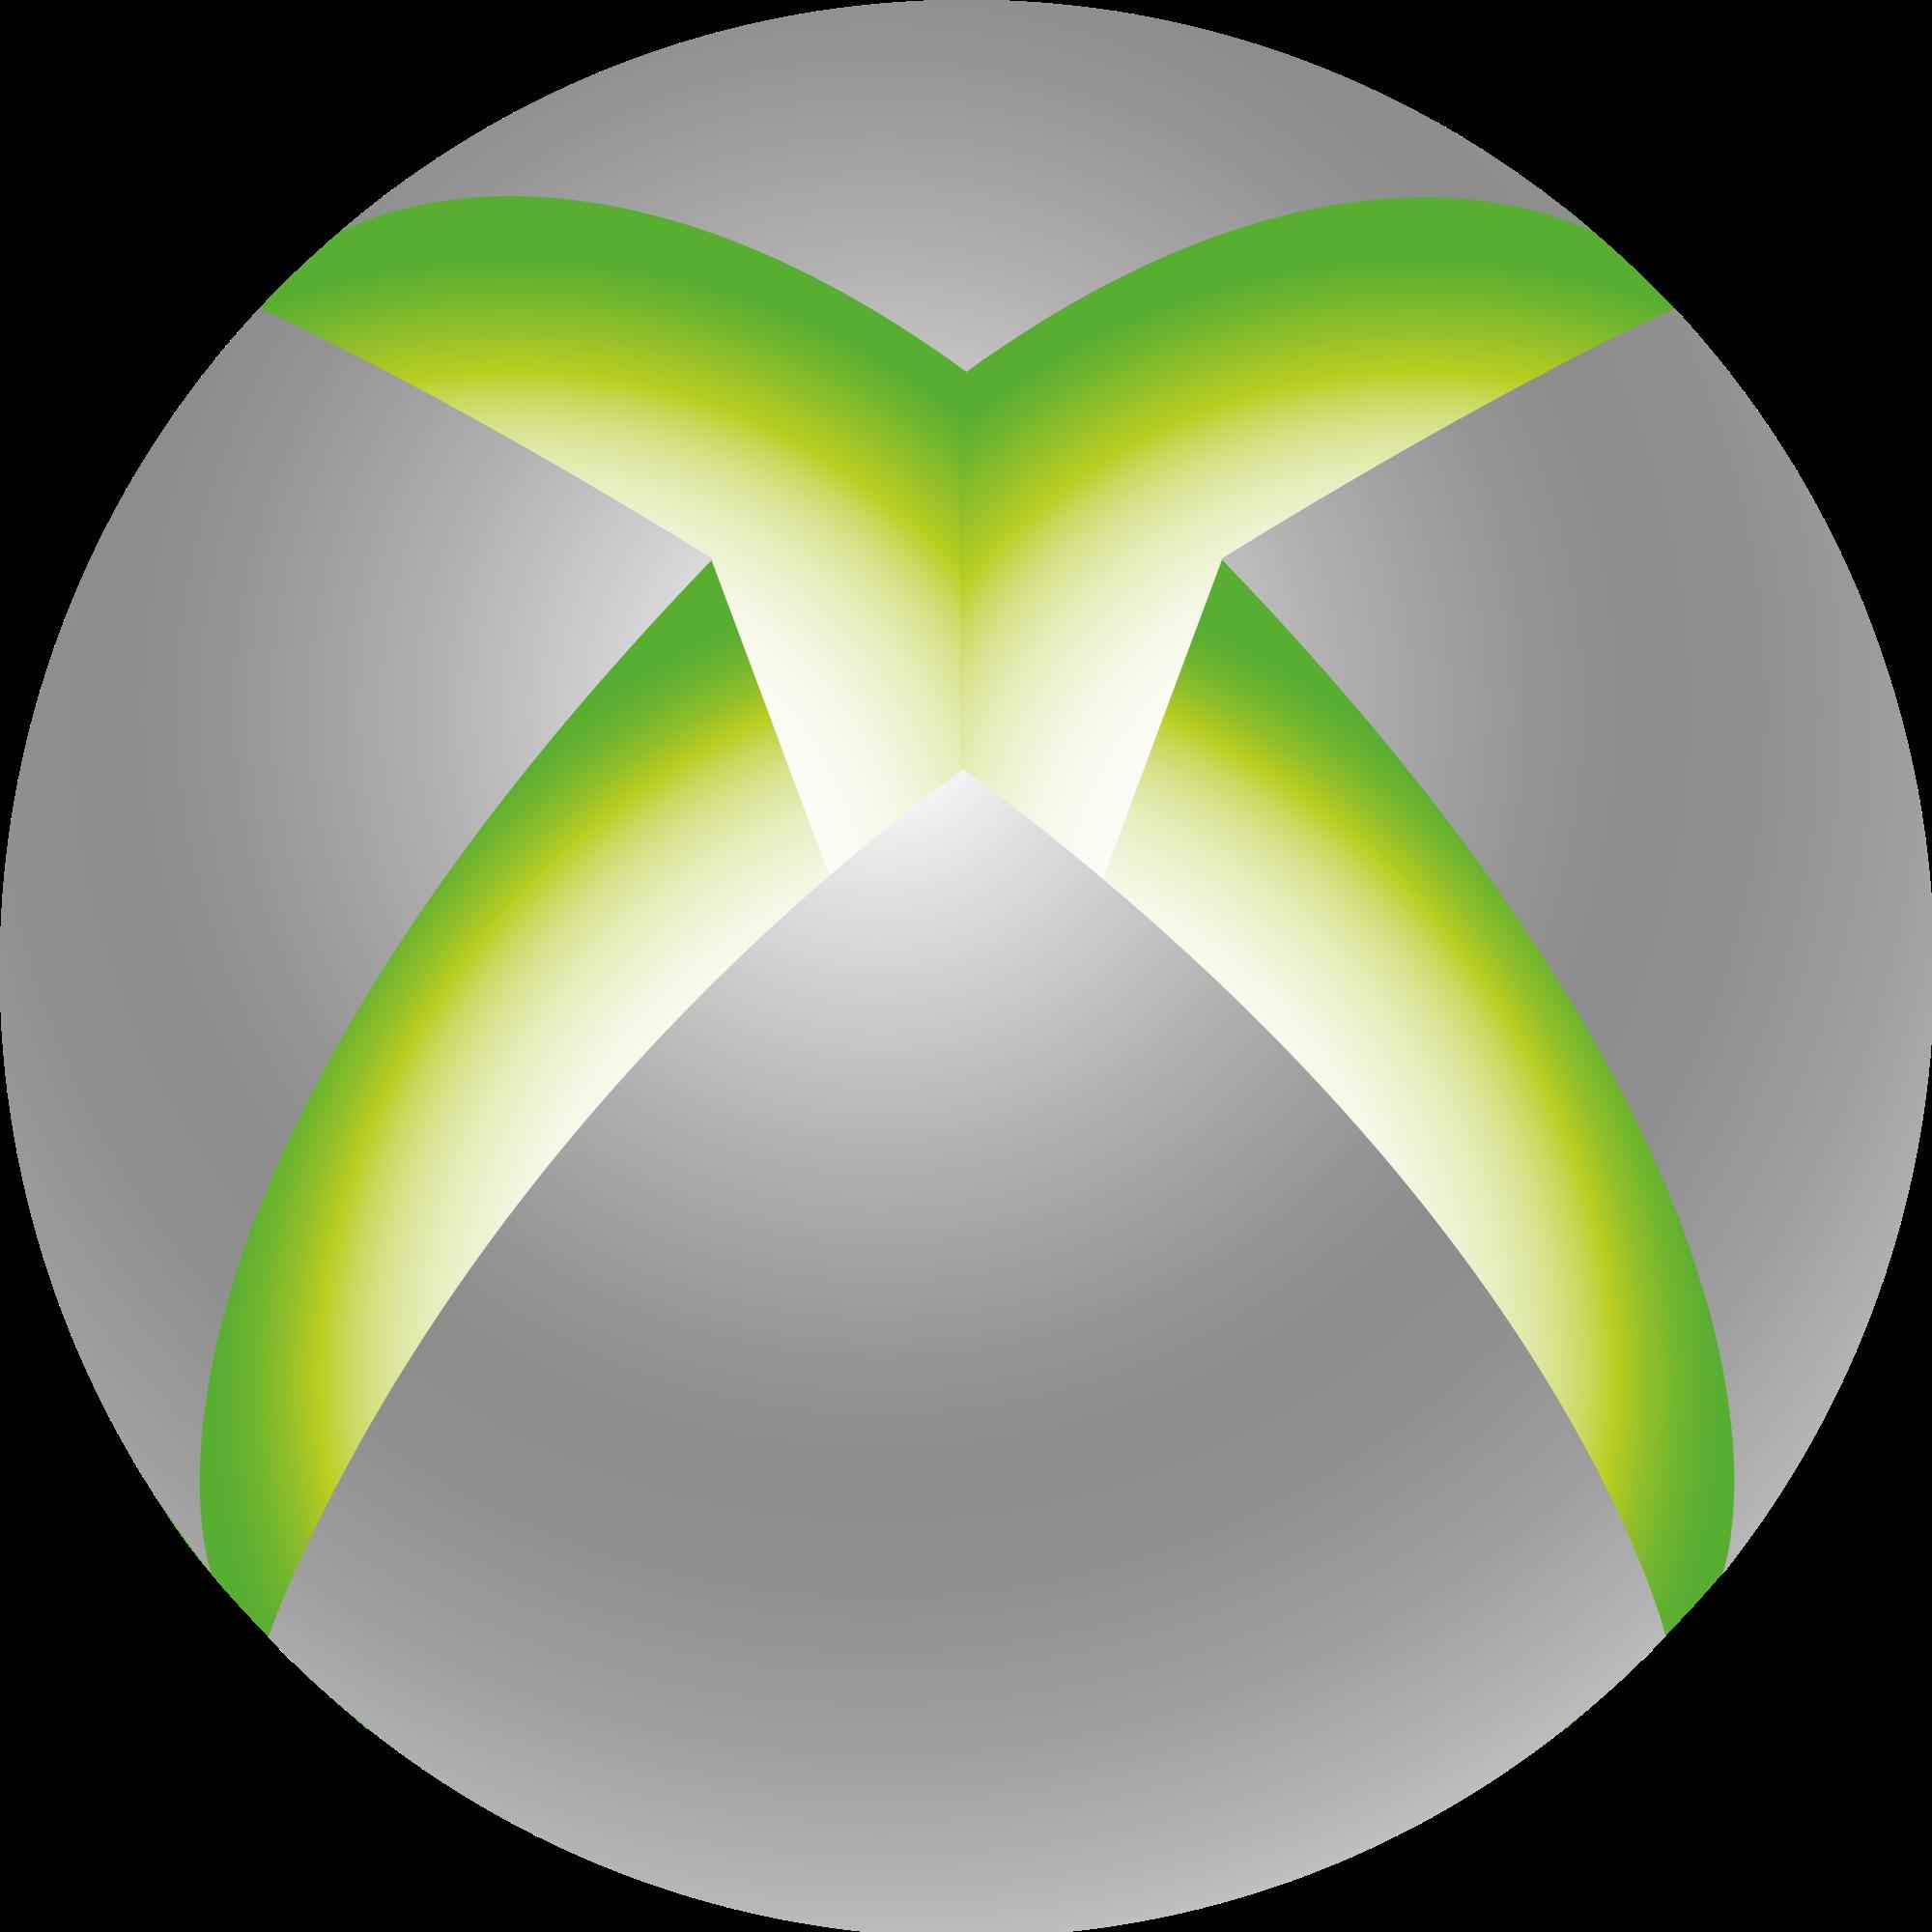 2000x2000 Xbox 360 Controller Symbols